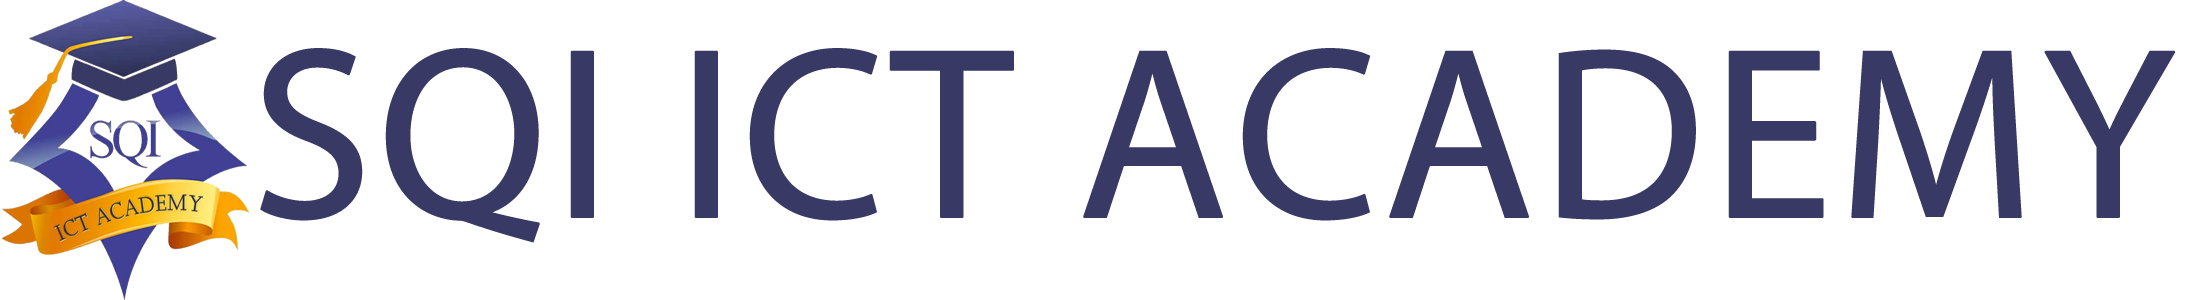 SQI ICT ACADEMY